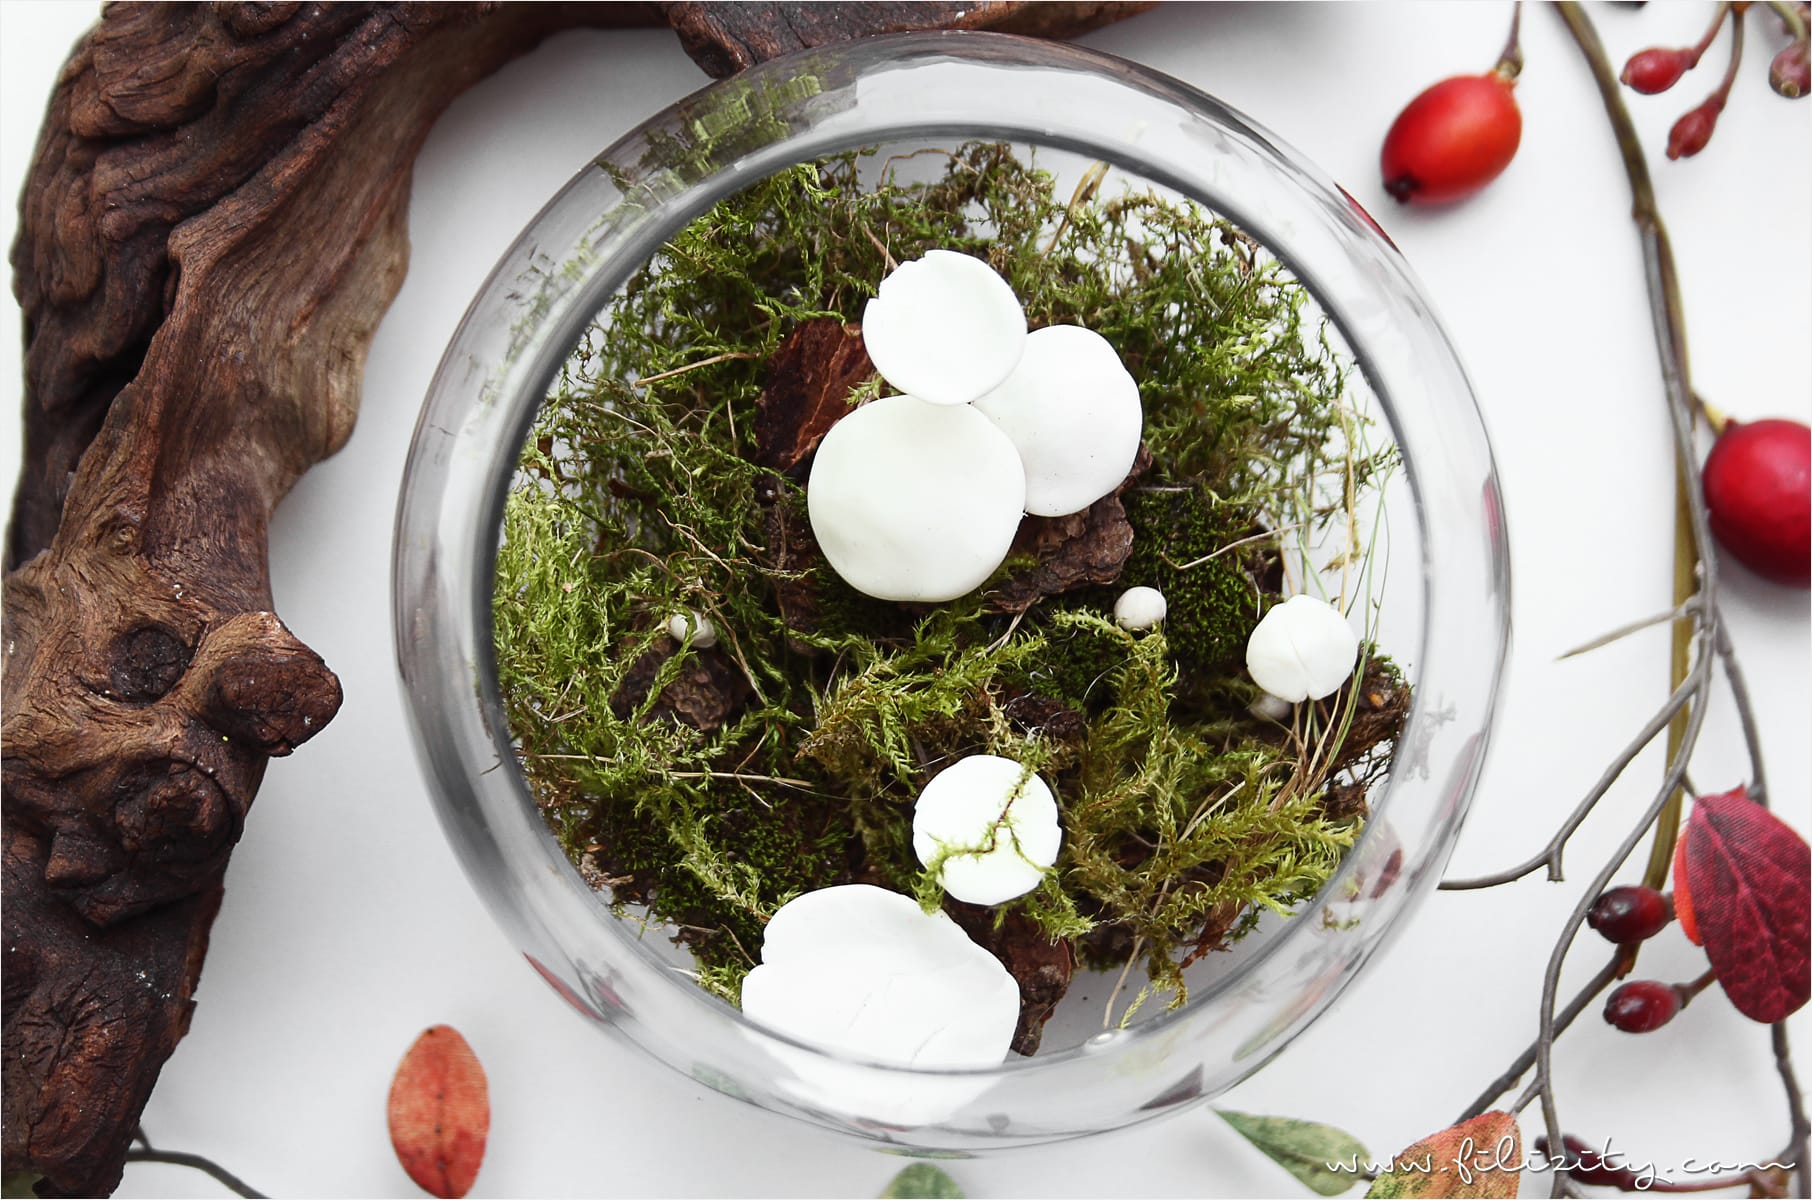 DIY Herbst-Deko mit Kaltporzellan-Pilzen #kaltporzellan #pilz #herbst #deko